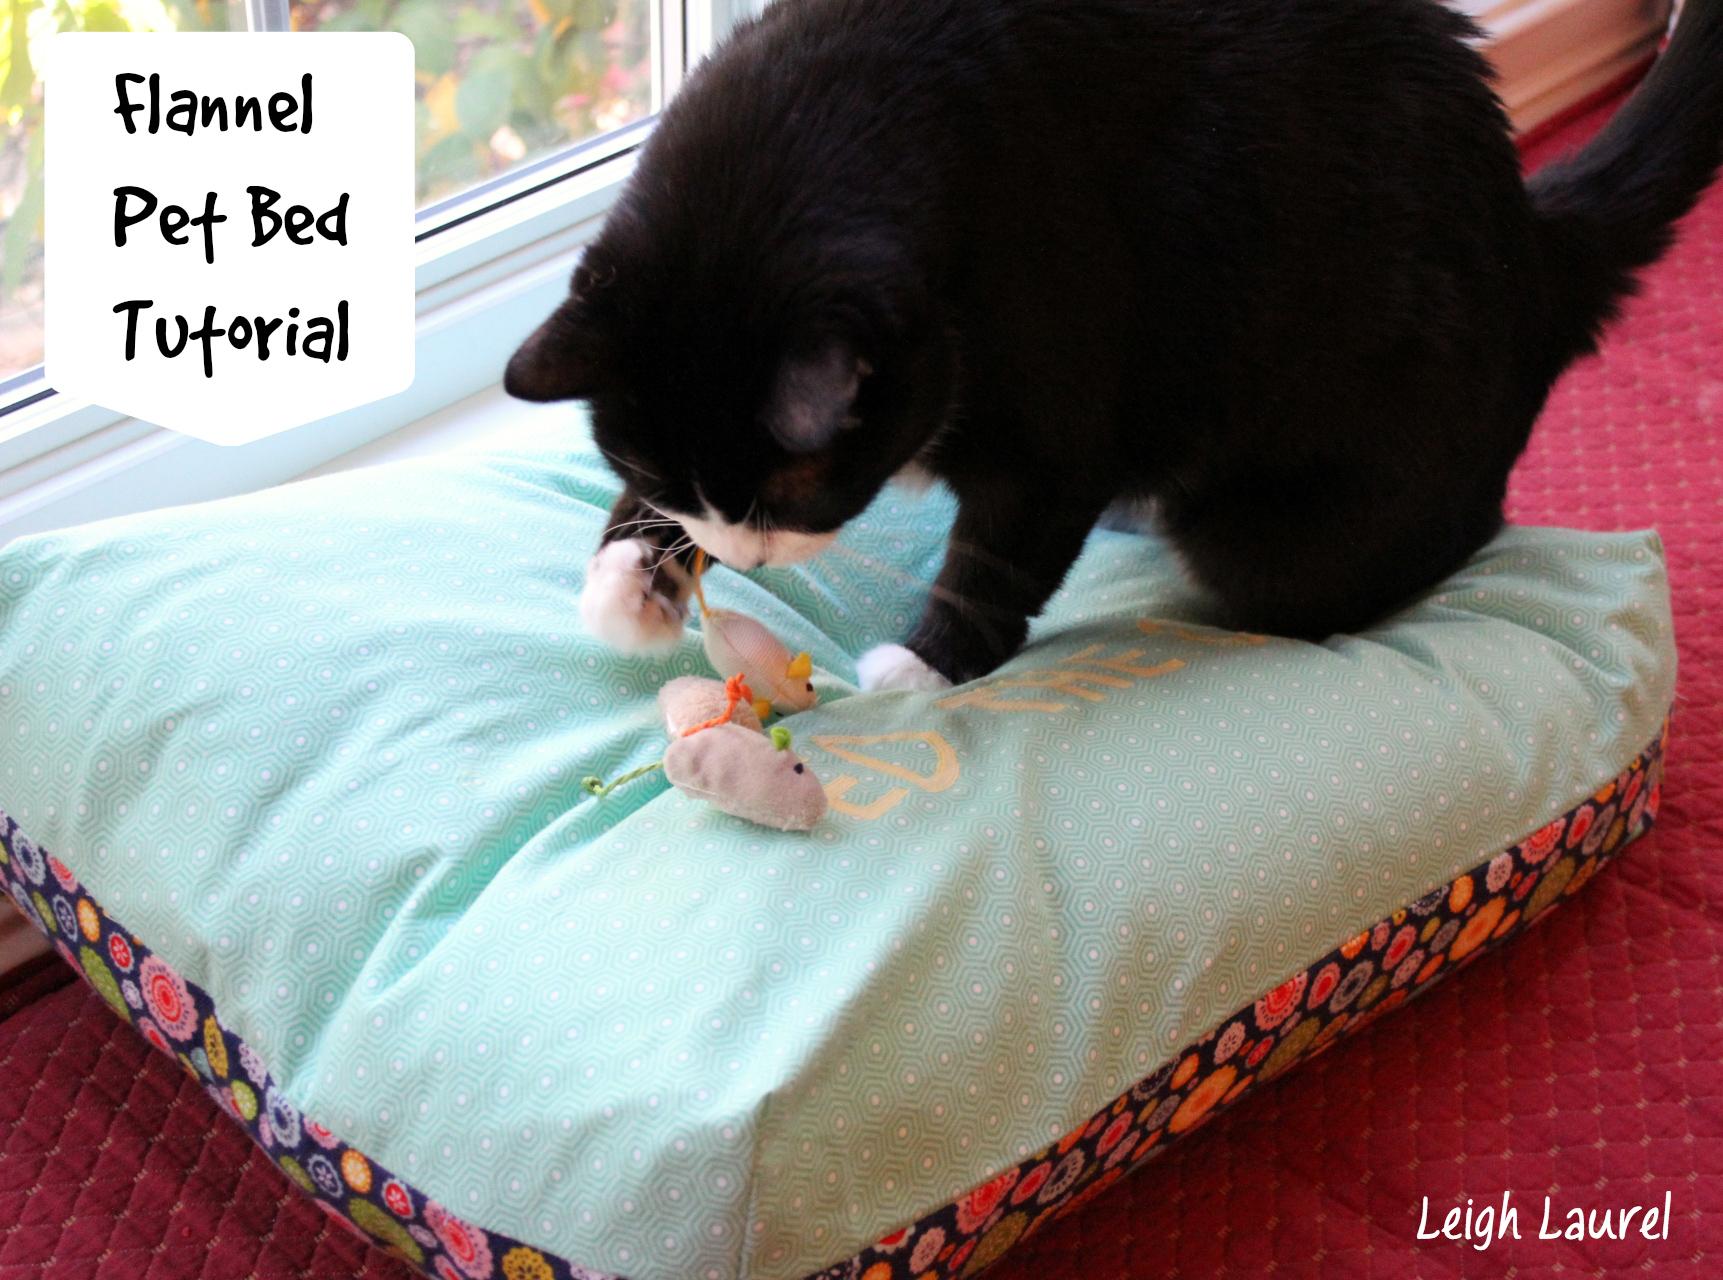 Flannel pet bed tutorial its reversible karin jordan studio personalized pet bed tutorial by karin jordan using riley blake flannels jeuxipadfo Gallery